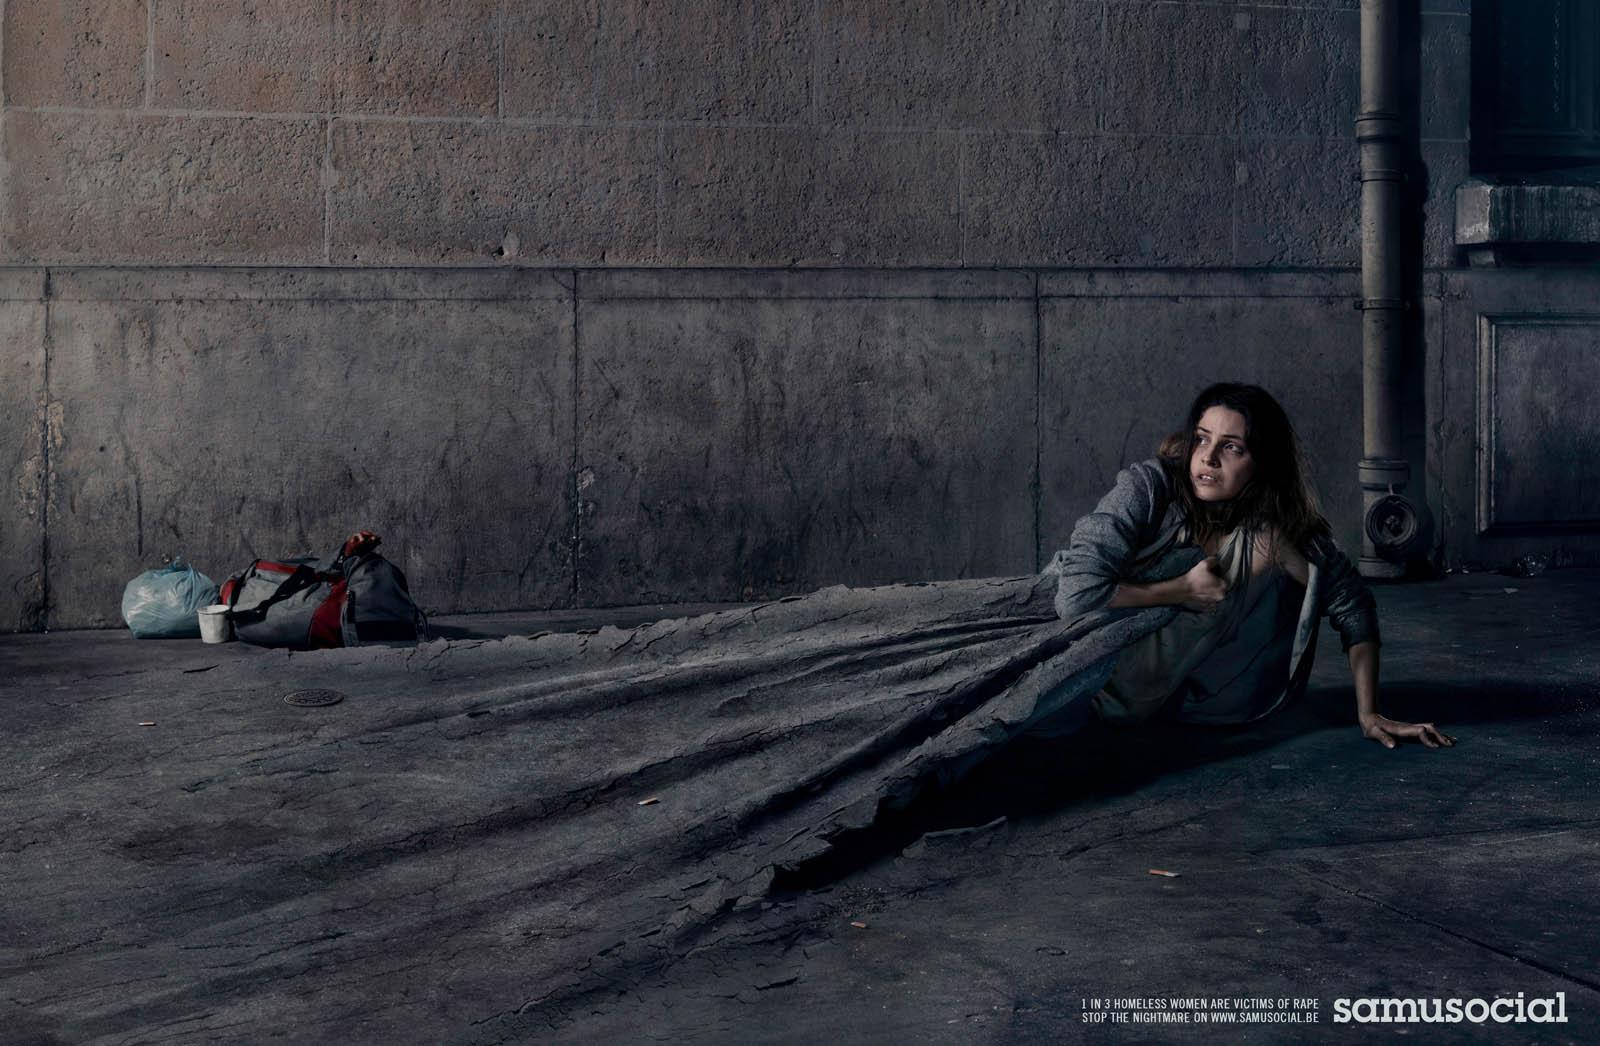 llllitl-samu-social-rape-viol-femme-women-sans-abri-homeless-clochard-bum-publicité-print-advertising-publicis-conseil-paris-france-mai-2012